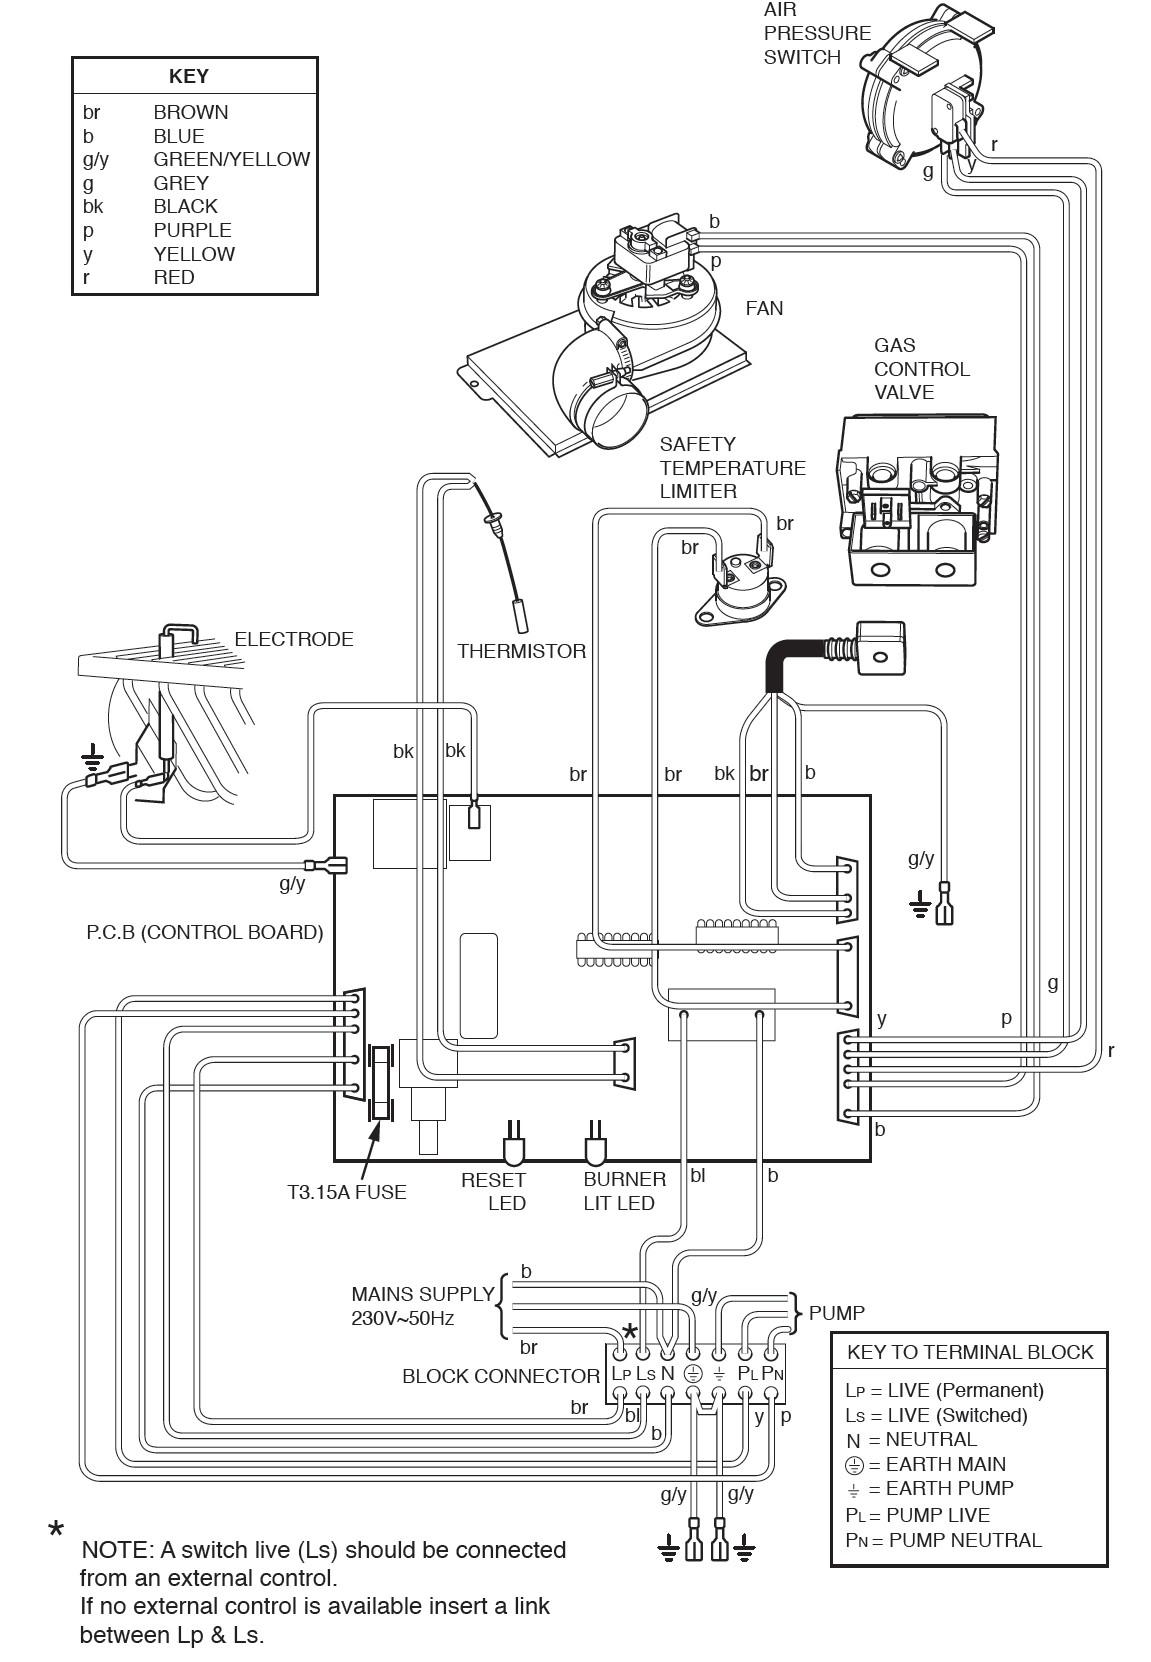 wiring pressure switch diagram